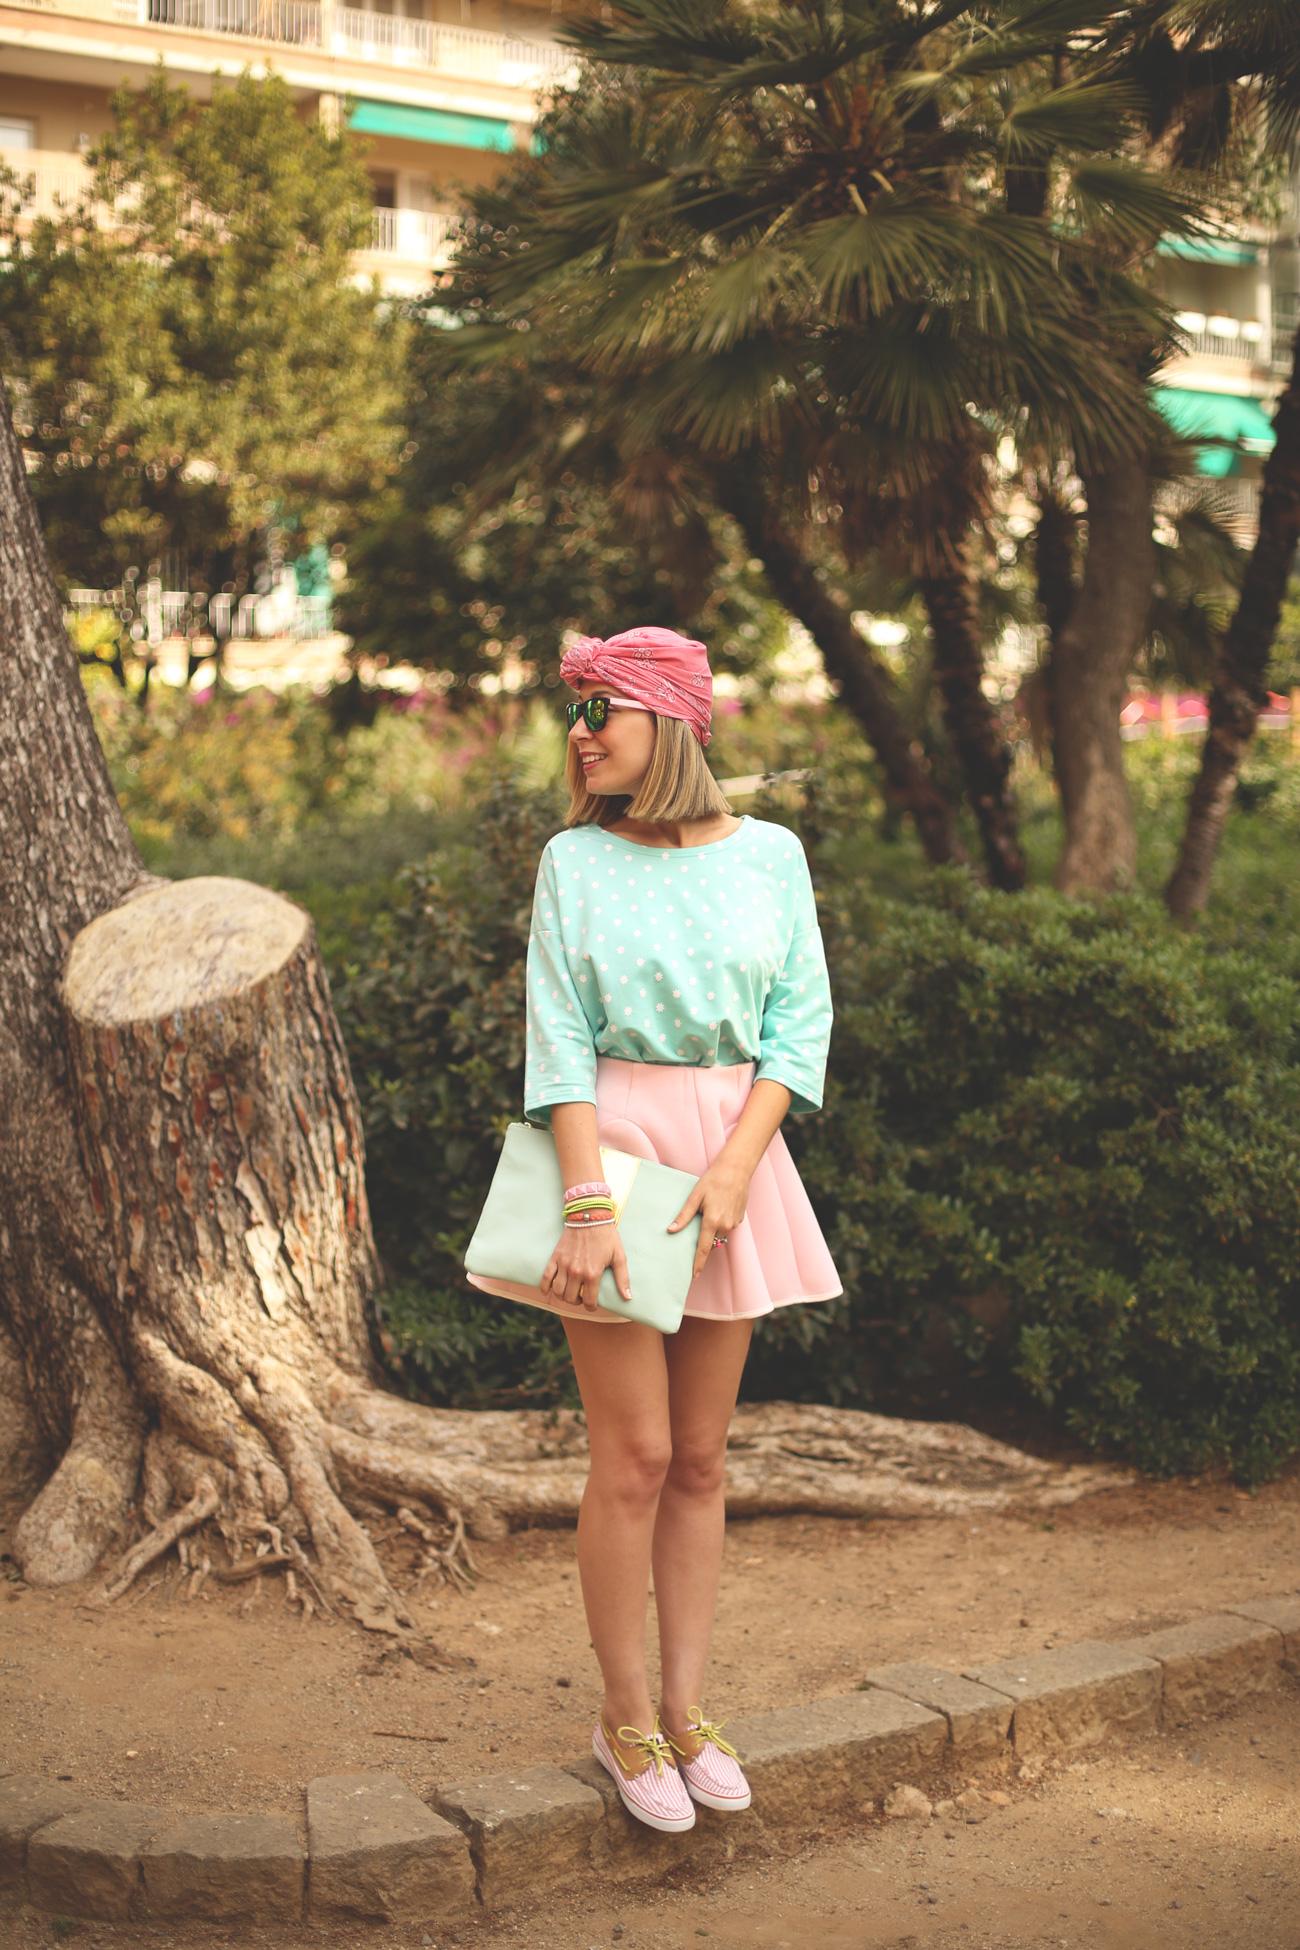 girl, blonde, fashion blogger, blackguard 64, gafas de espejo, falda rosa, look lady, skater outfit, turbante, steve madden, spanish blog,